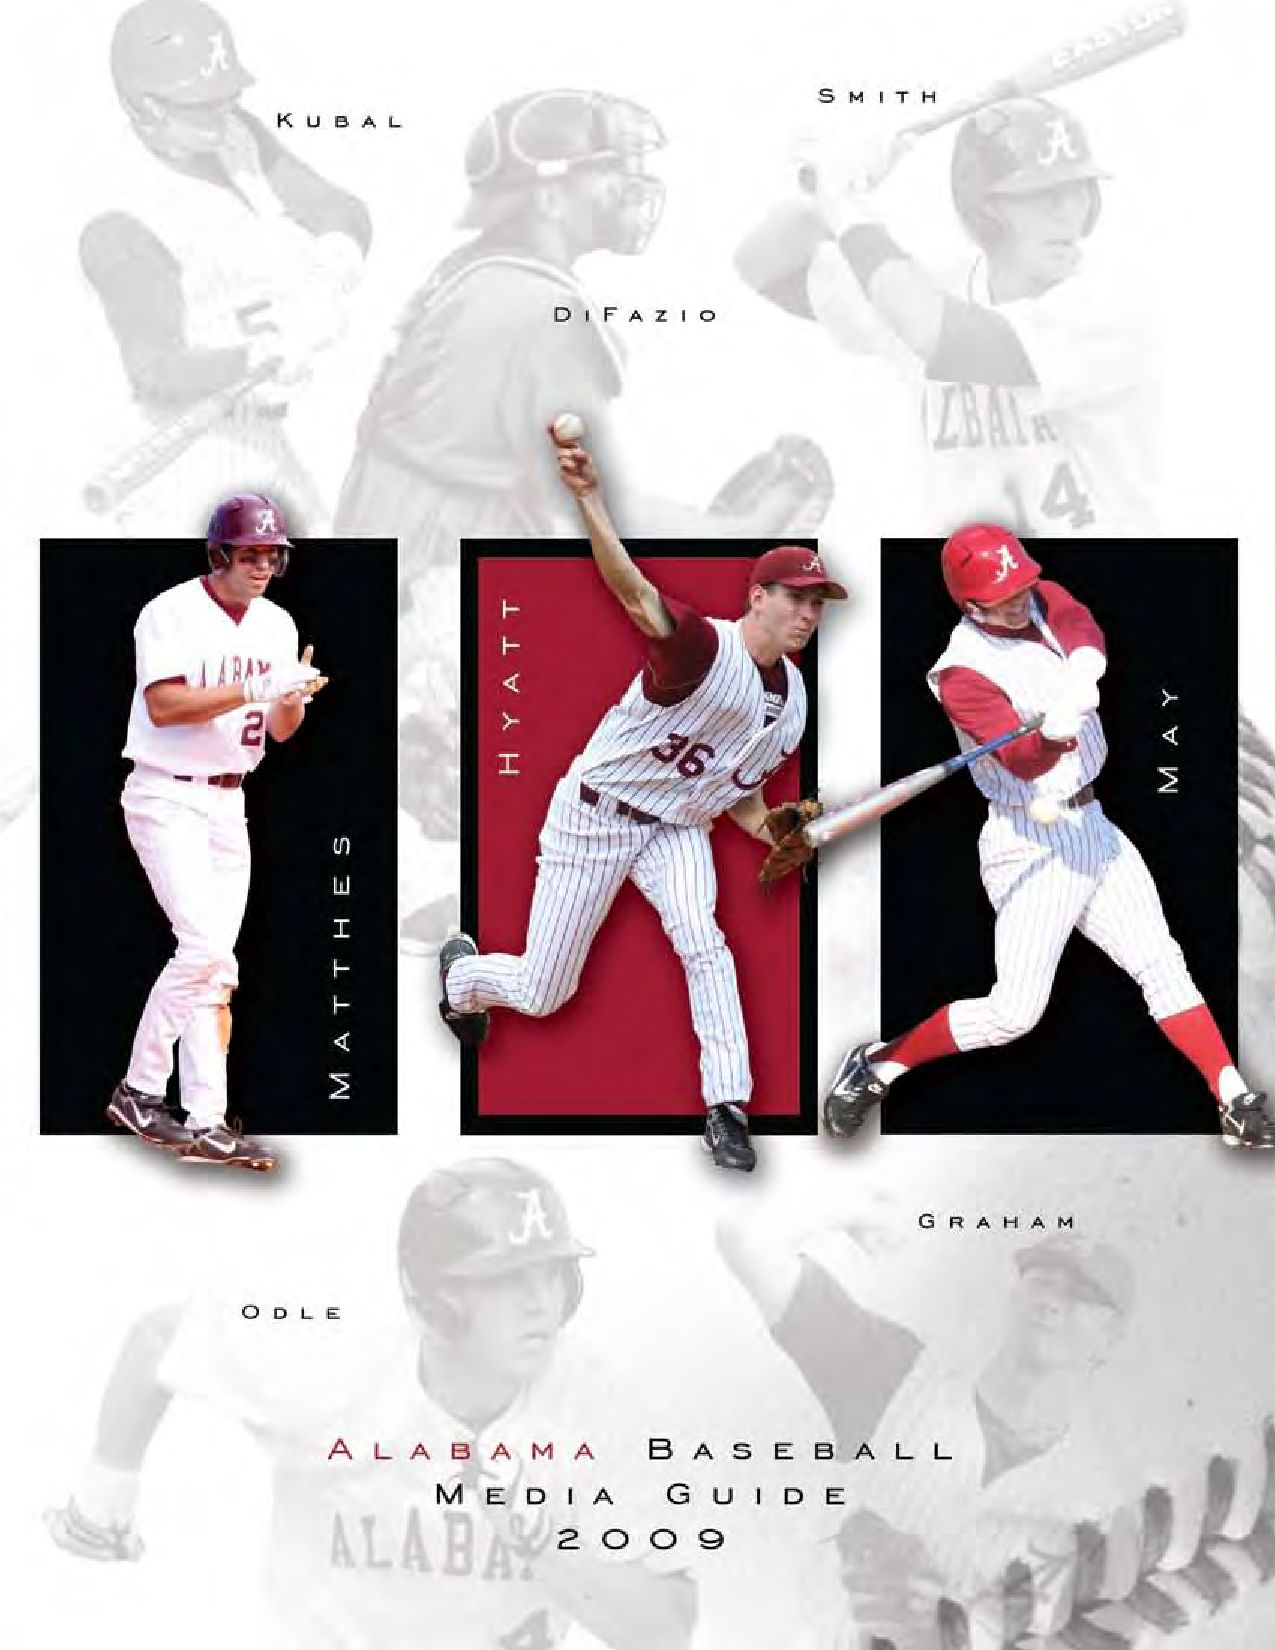 2009 Alabama Baseball Media Guide by Alabama Crimson Tide issuu